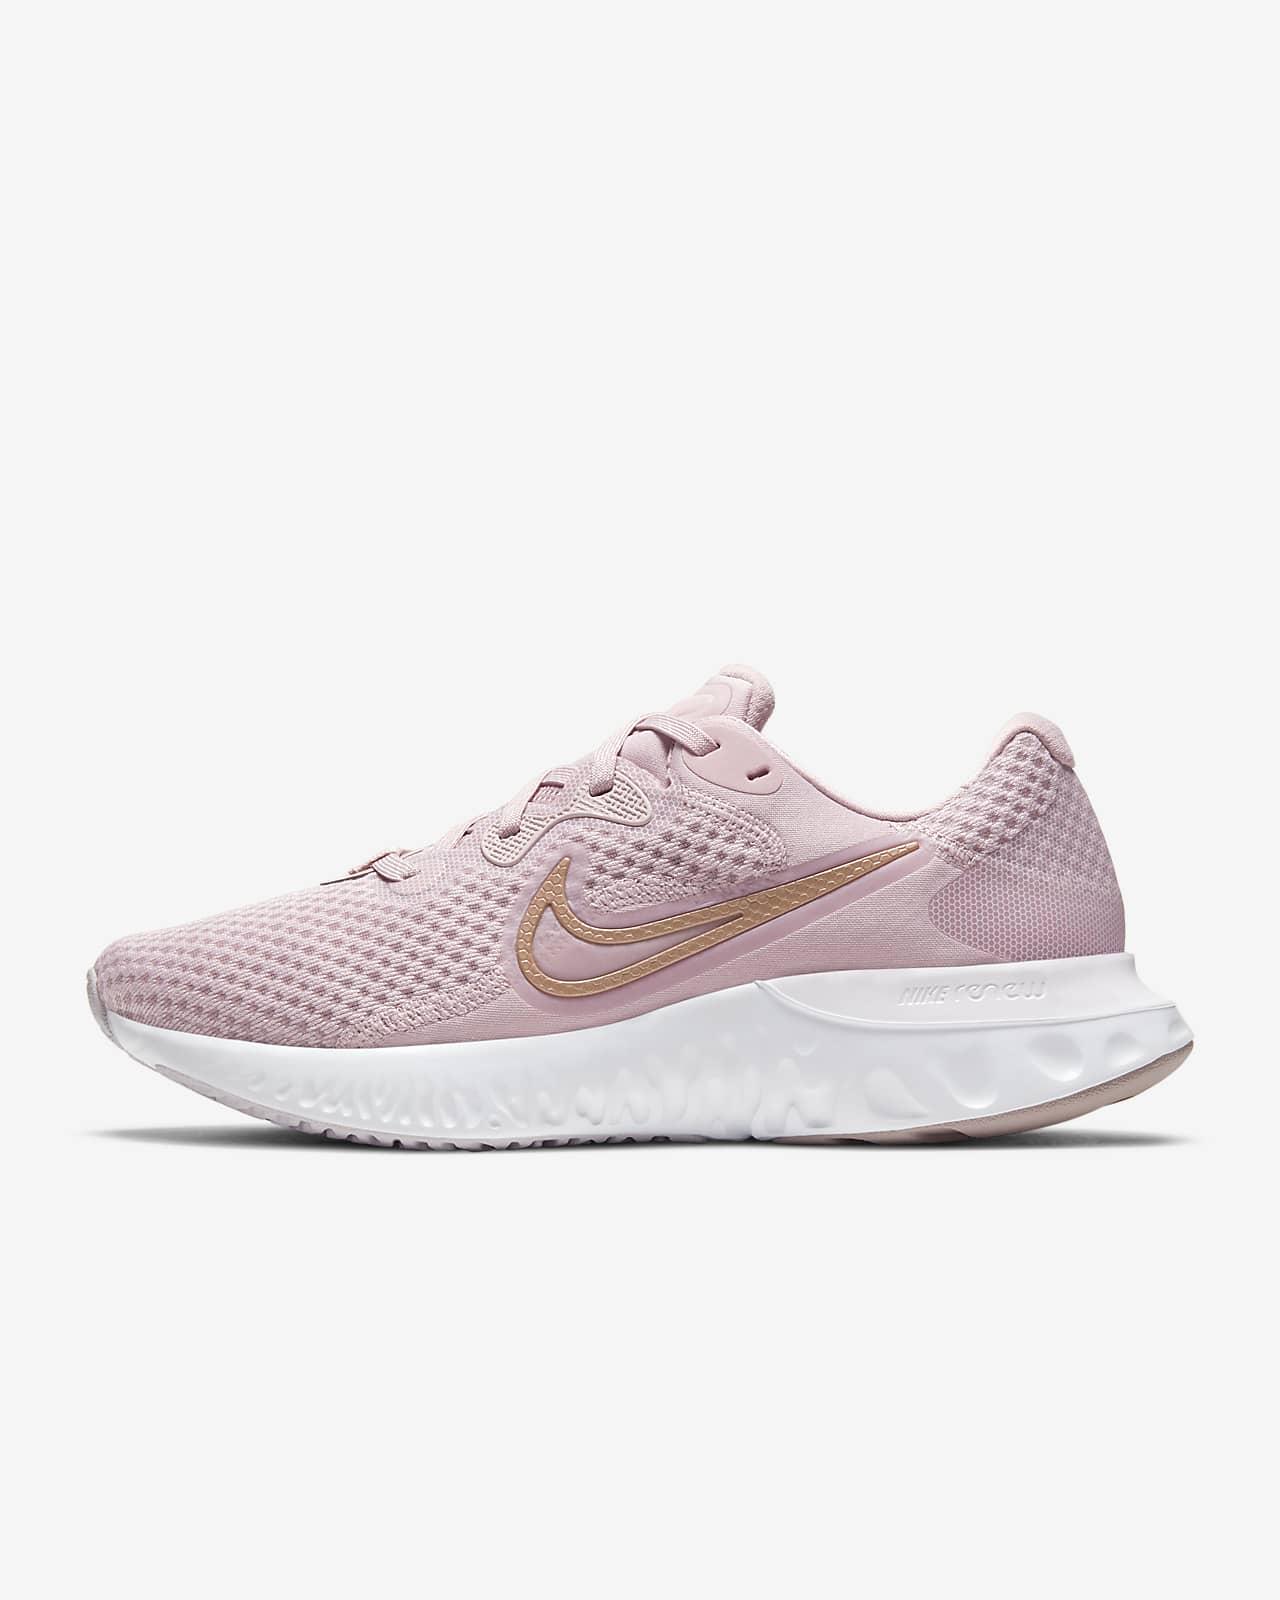 Chaussure de running Nike Renew Run 2 pour Femme. Nike FR